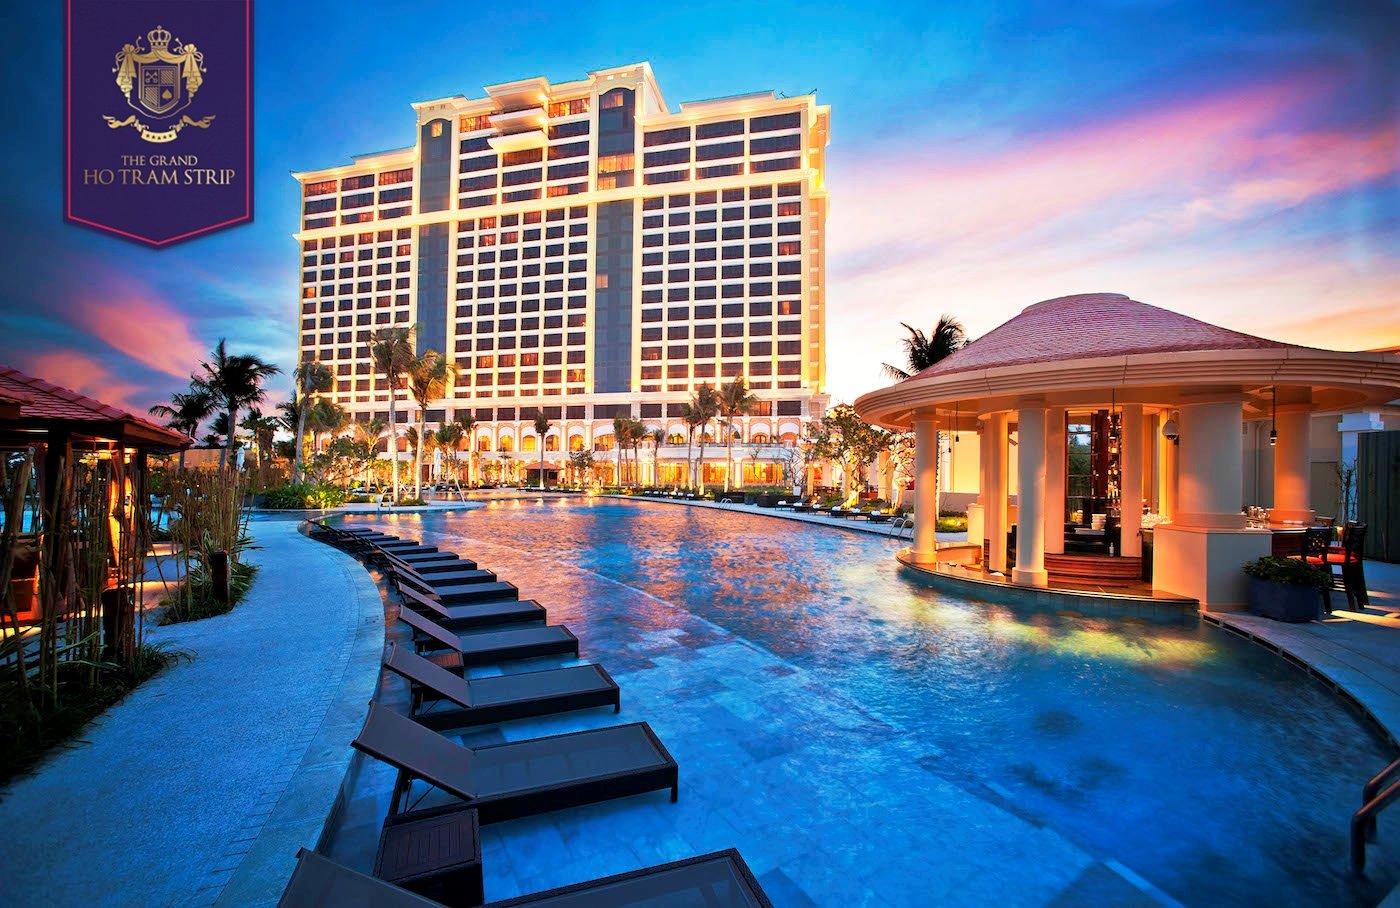 The Grand Hồ Tràm Strip Resort